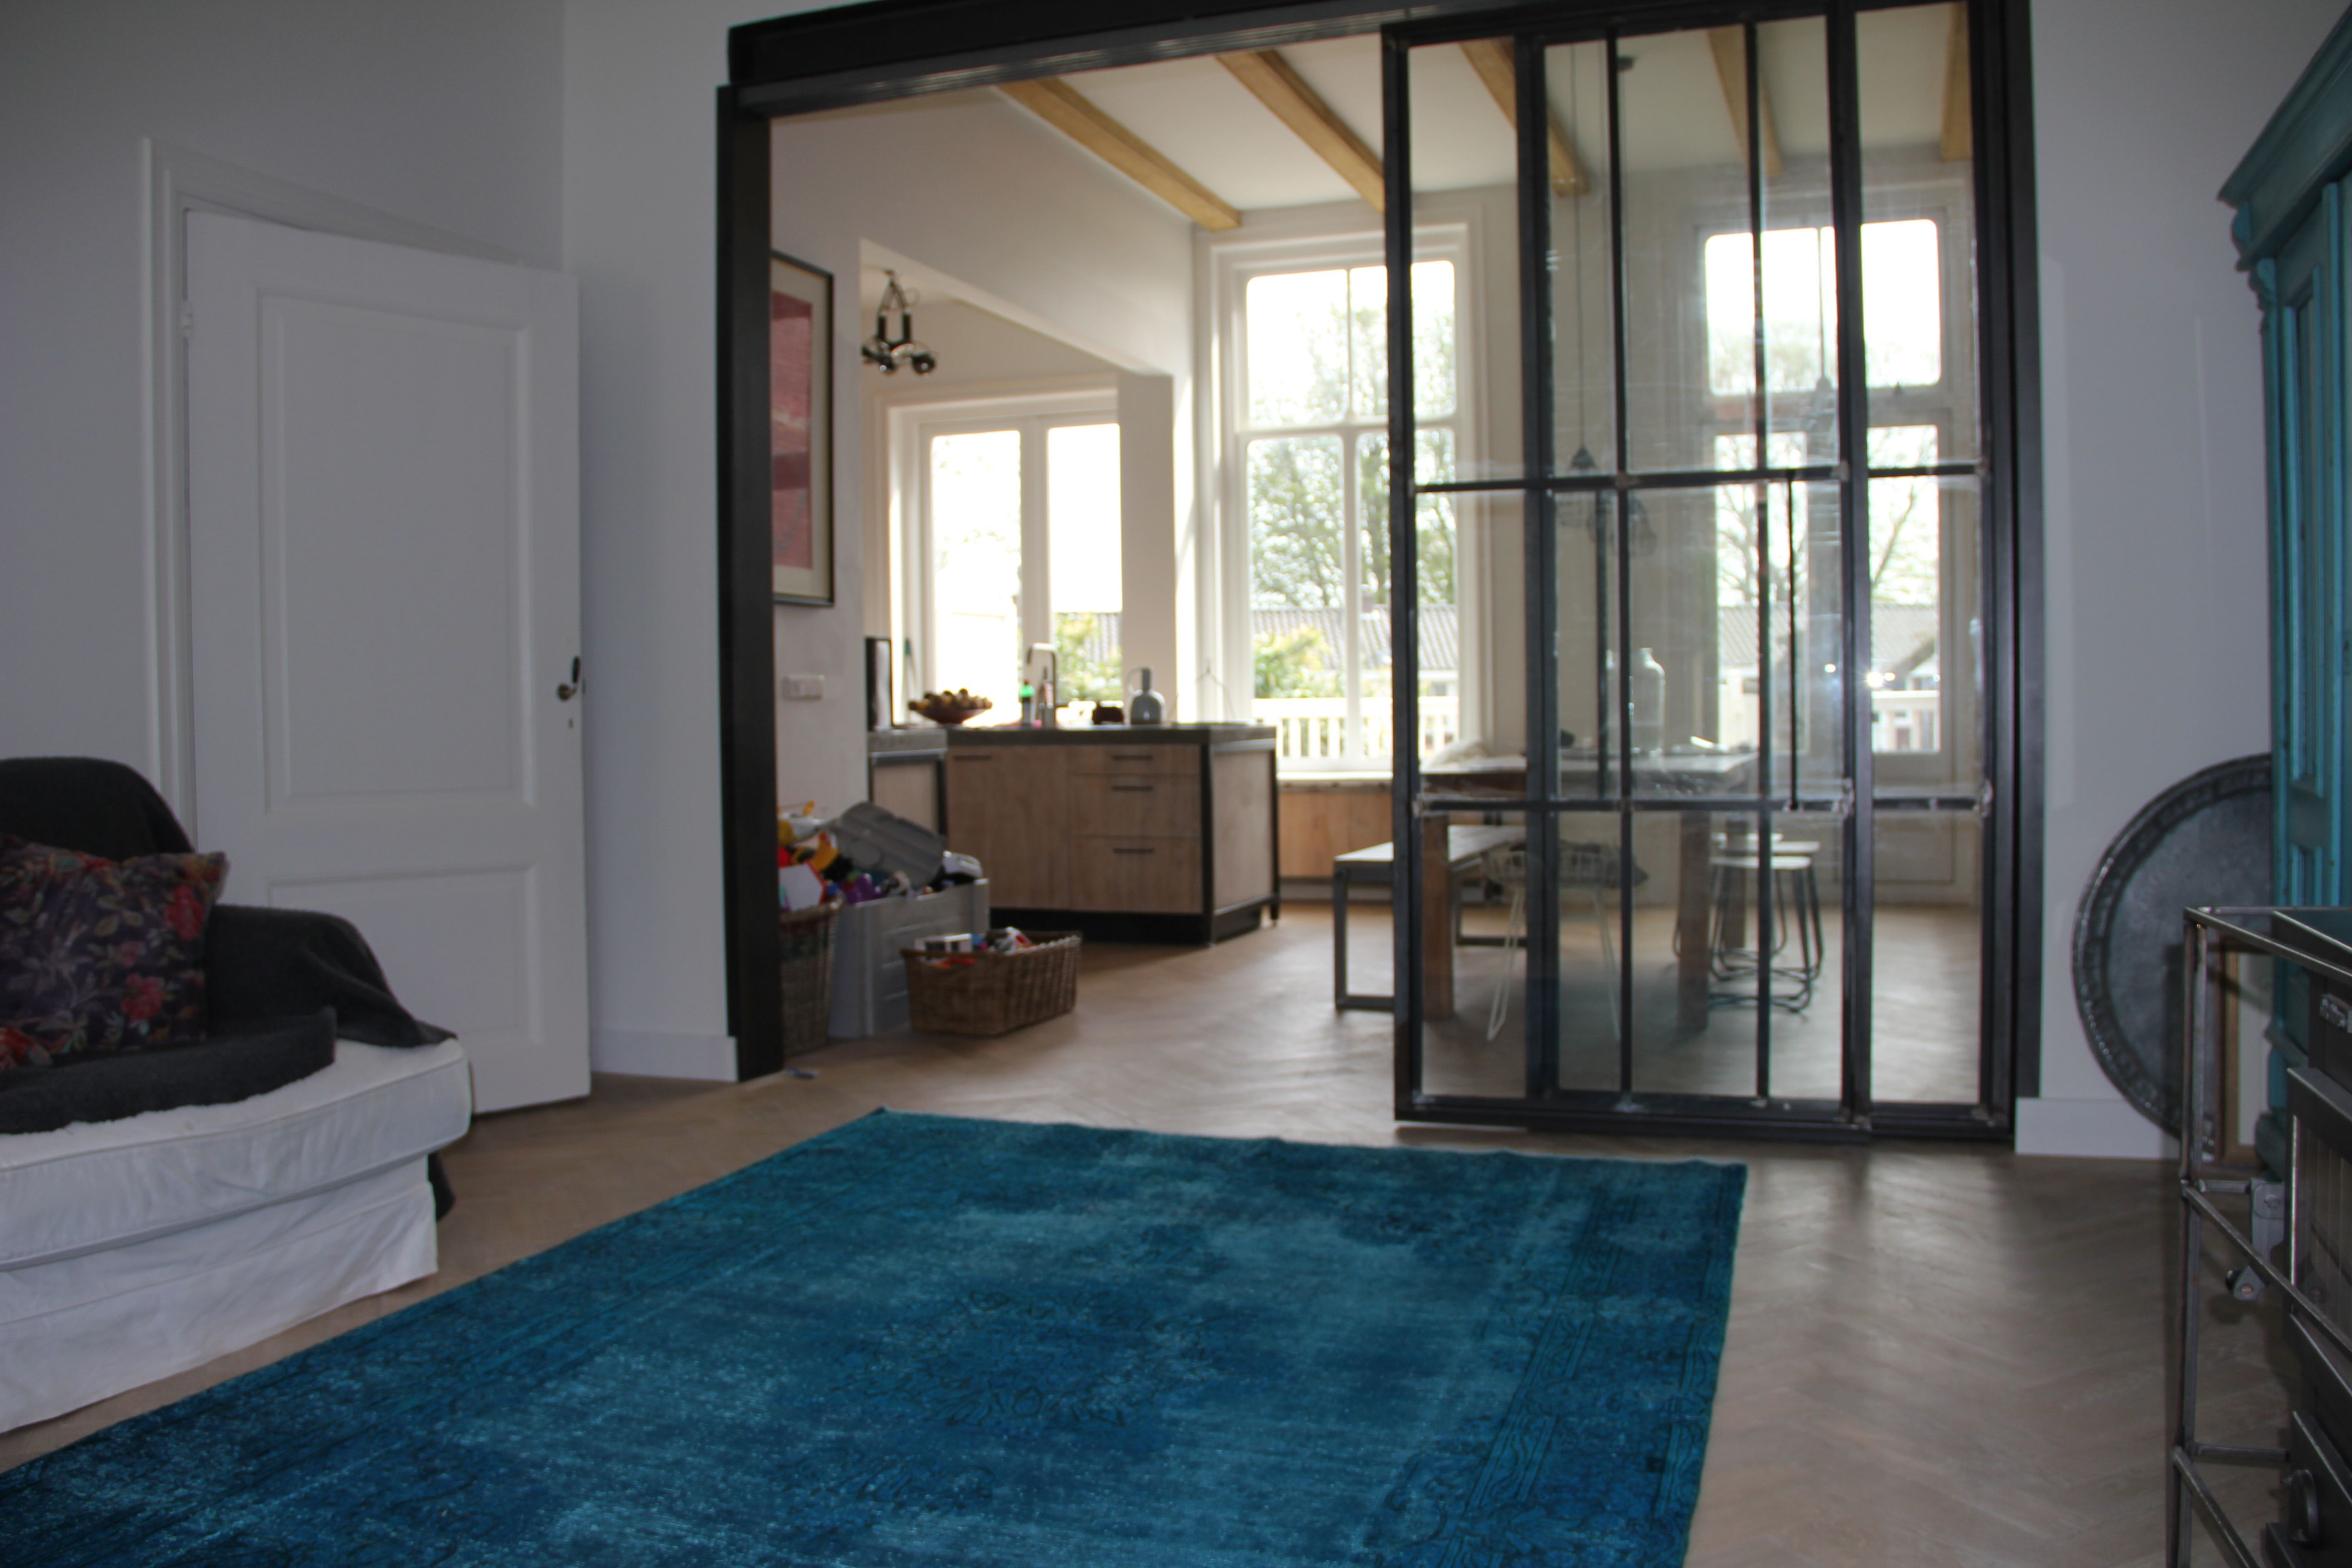 Top cool ideas dining room divider transom windows bamboo room